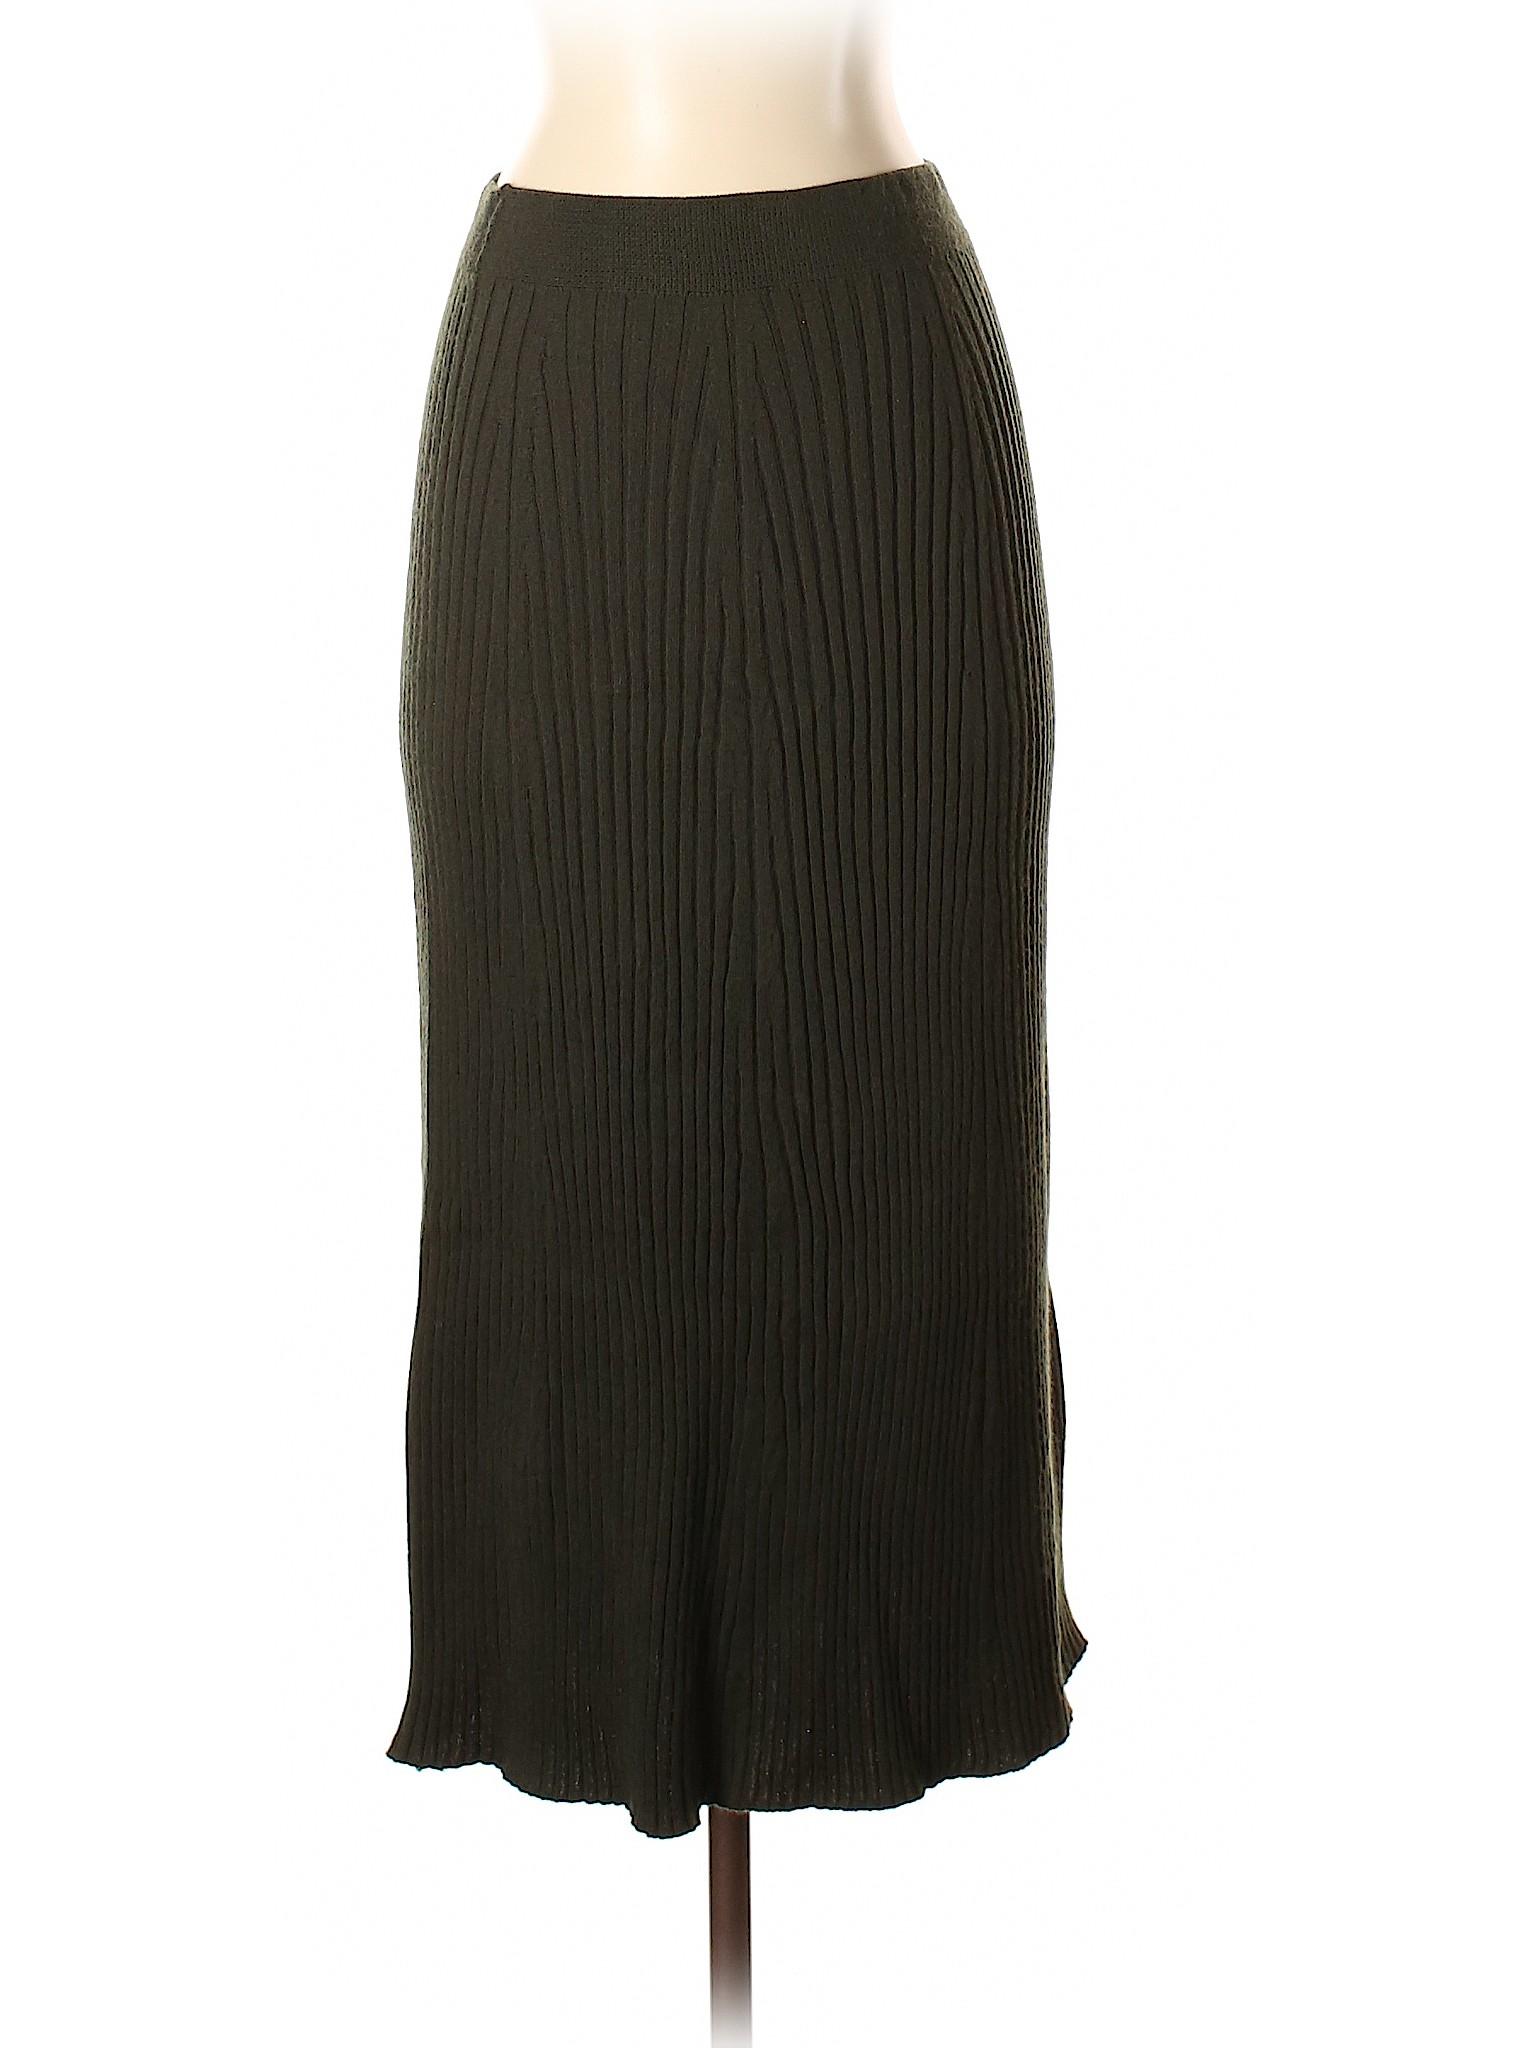 Skirt Boutique Boutique Skirt Casual Leisure Uniqlo Casual Leisure Uniqlo 1wvqH5